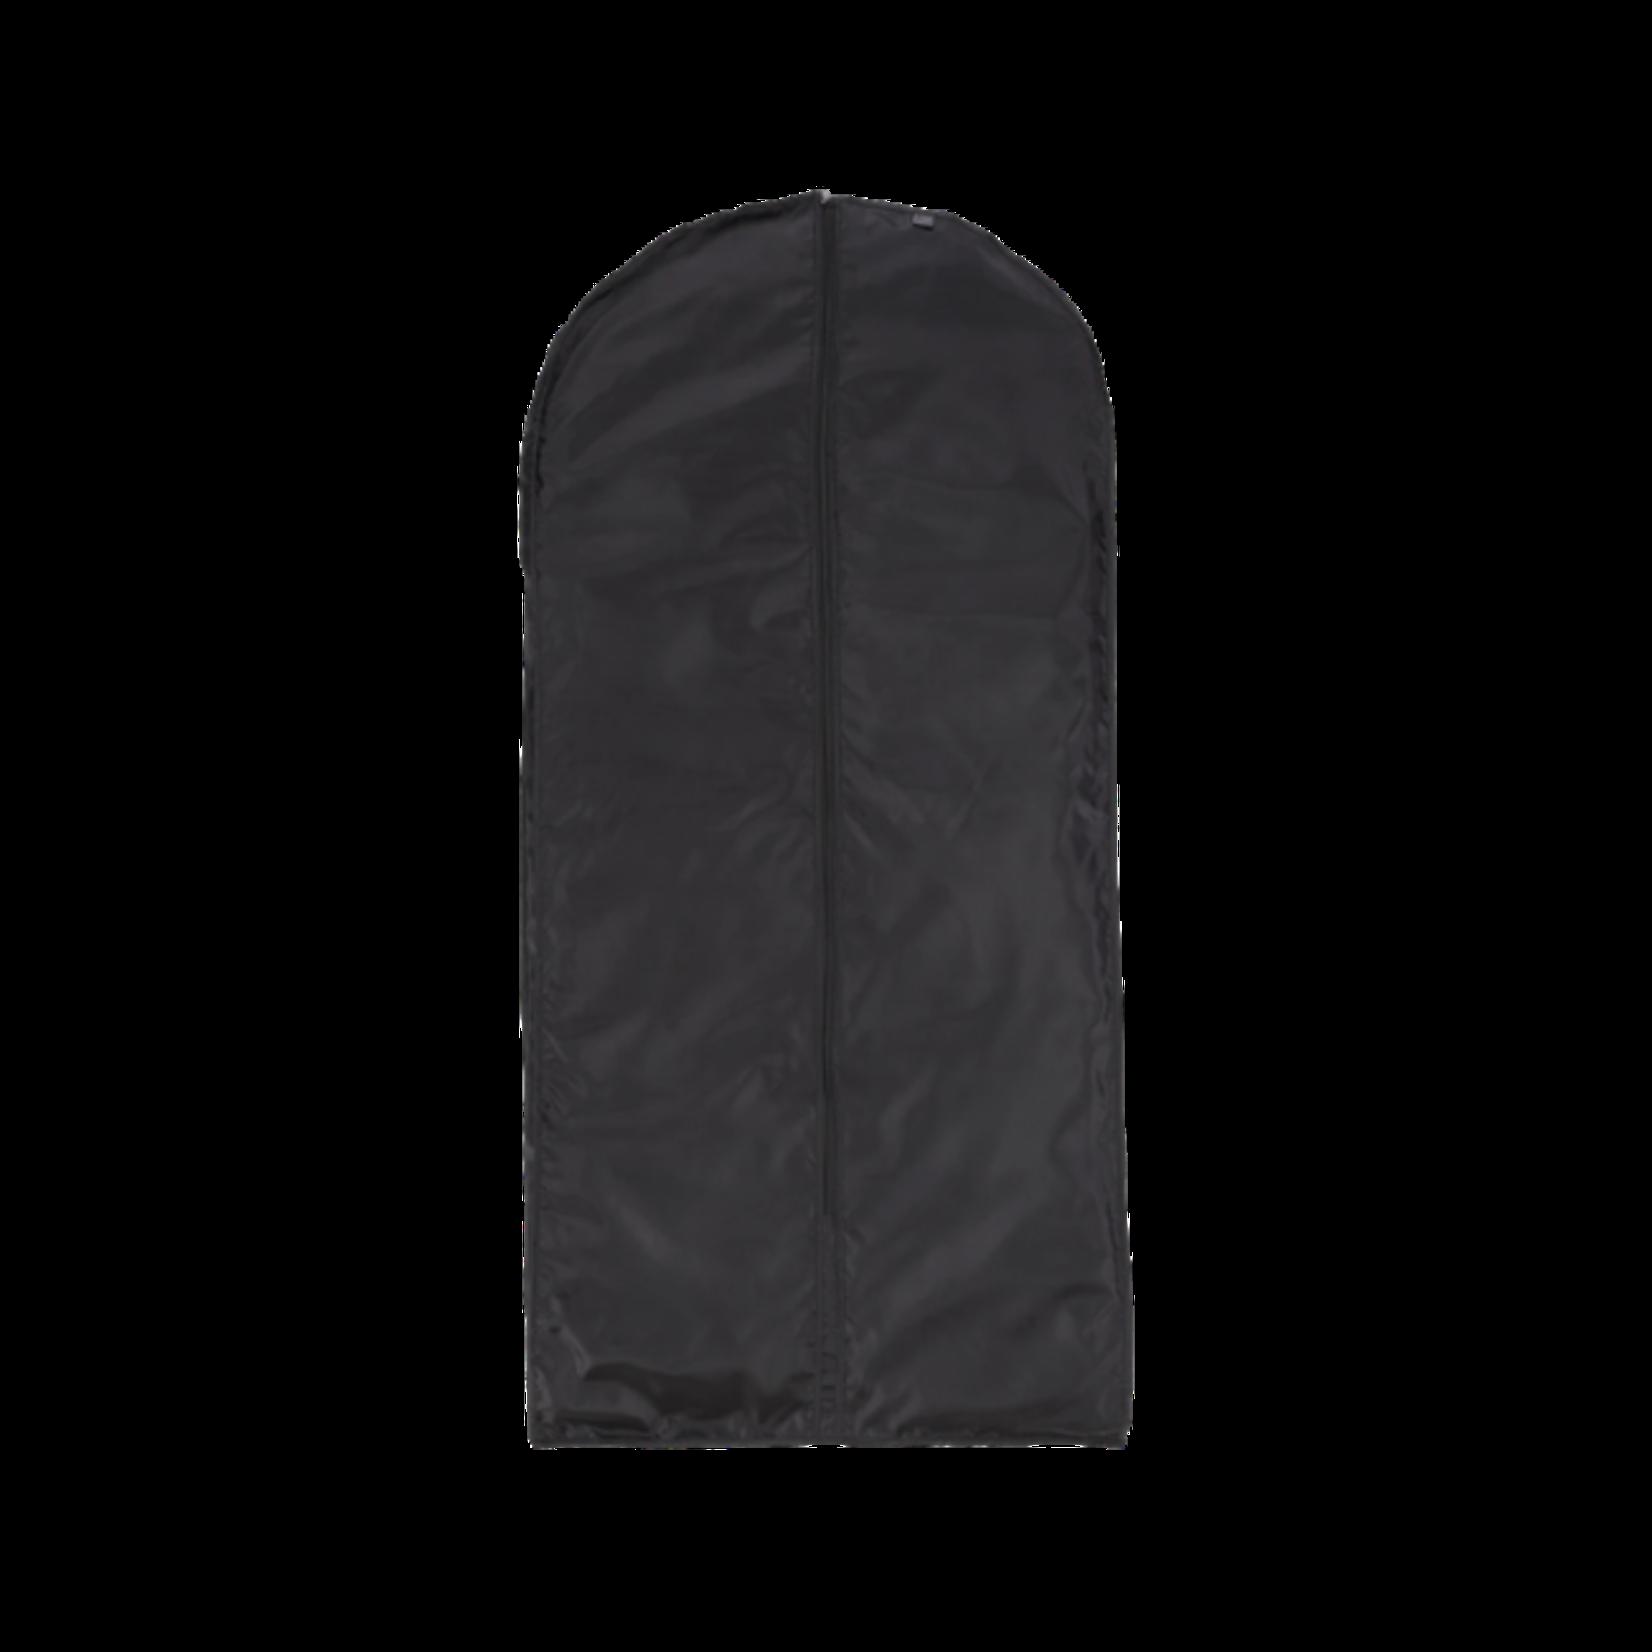 LIGHTWEIGHT GARMENT BAG BLACK